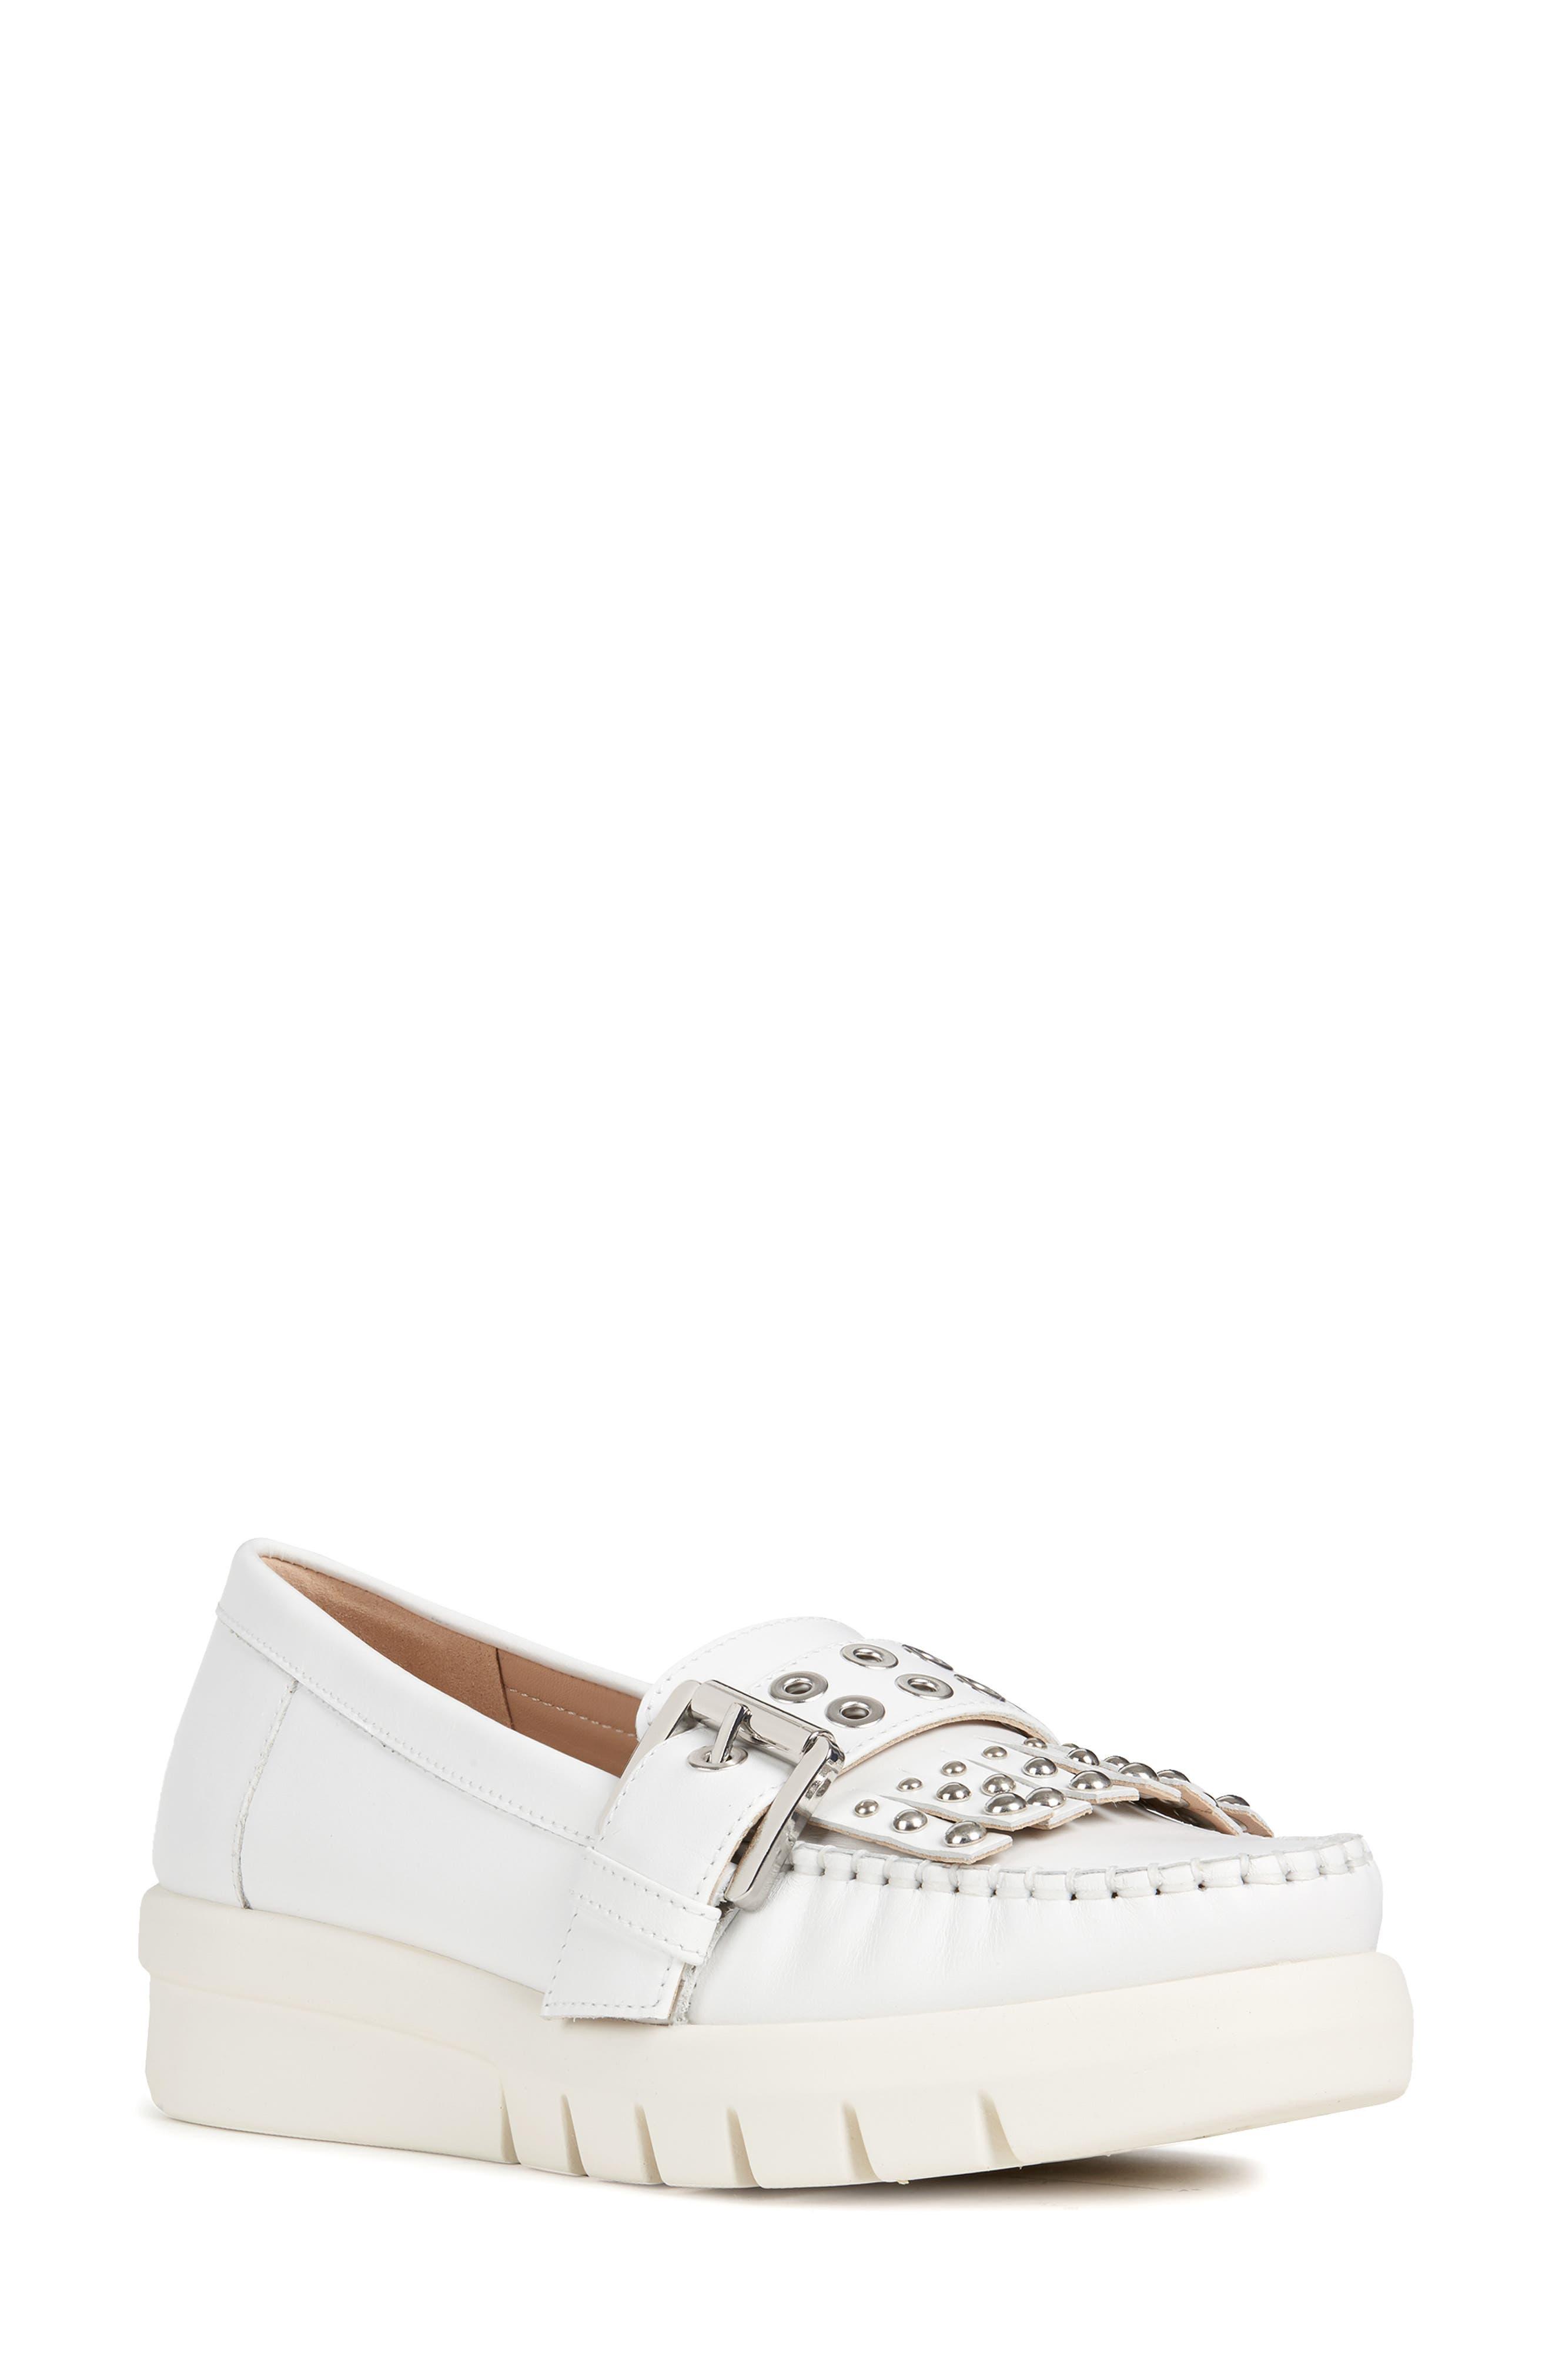 Geox Wimbley Studded Kiltie Loafer, White